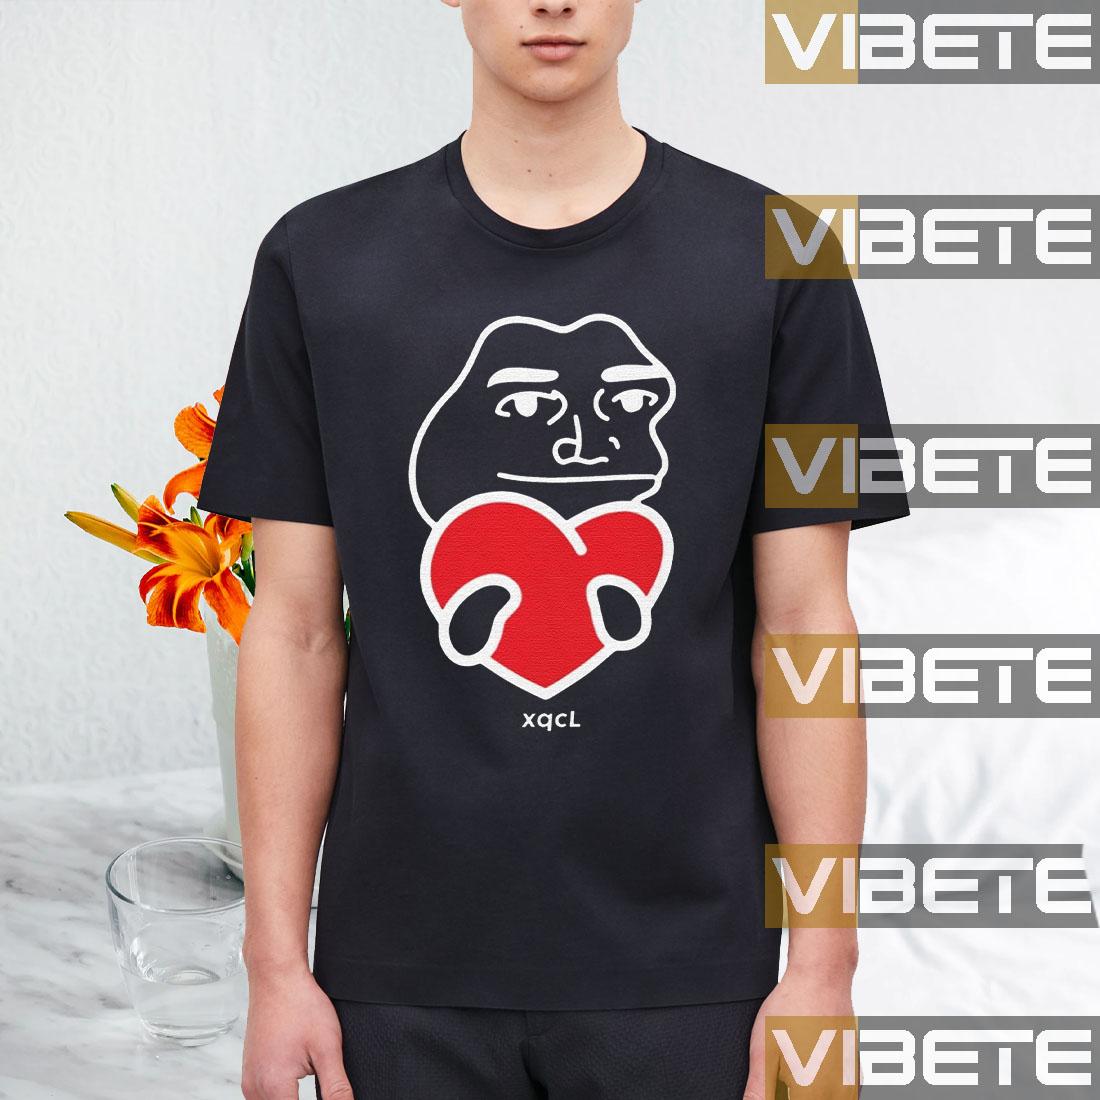 xqcl t-shirt